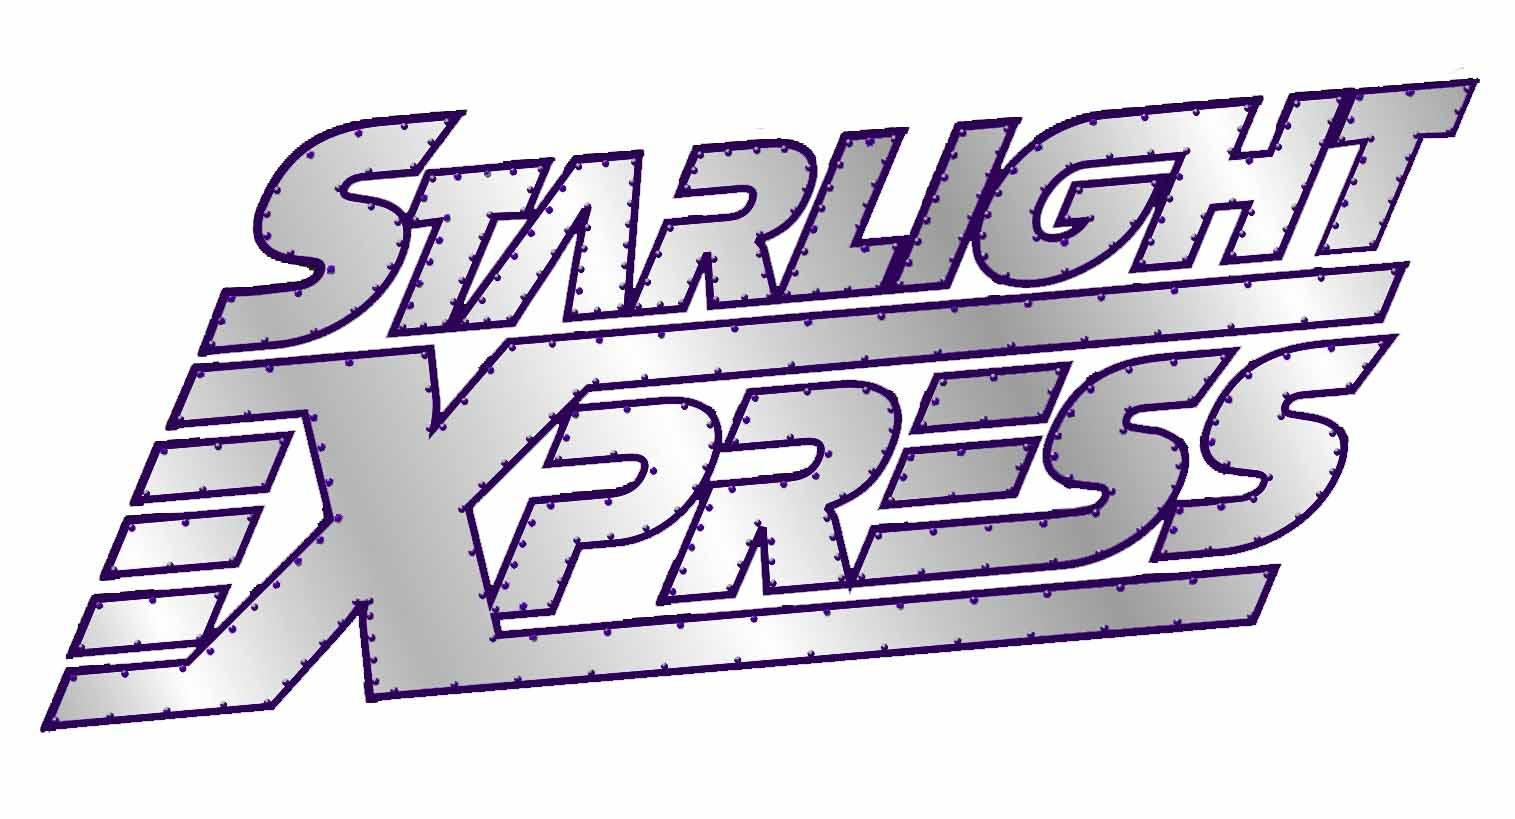 starlight express june 2016 ringwood school arts foundation. Black Bedroom Furniture Sets. Home Design Ideas